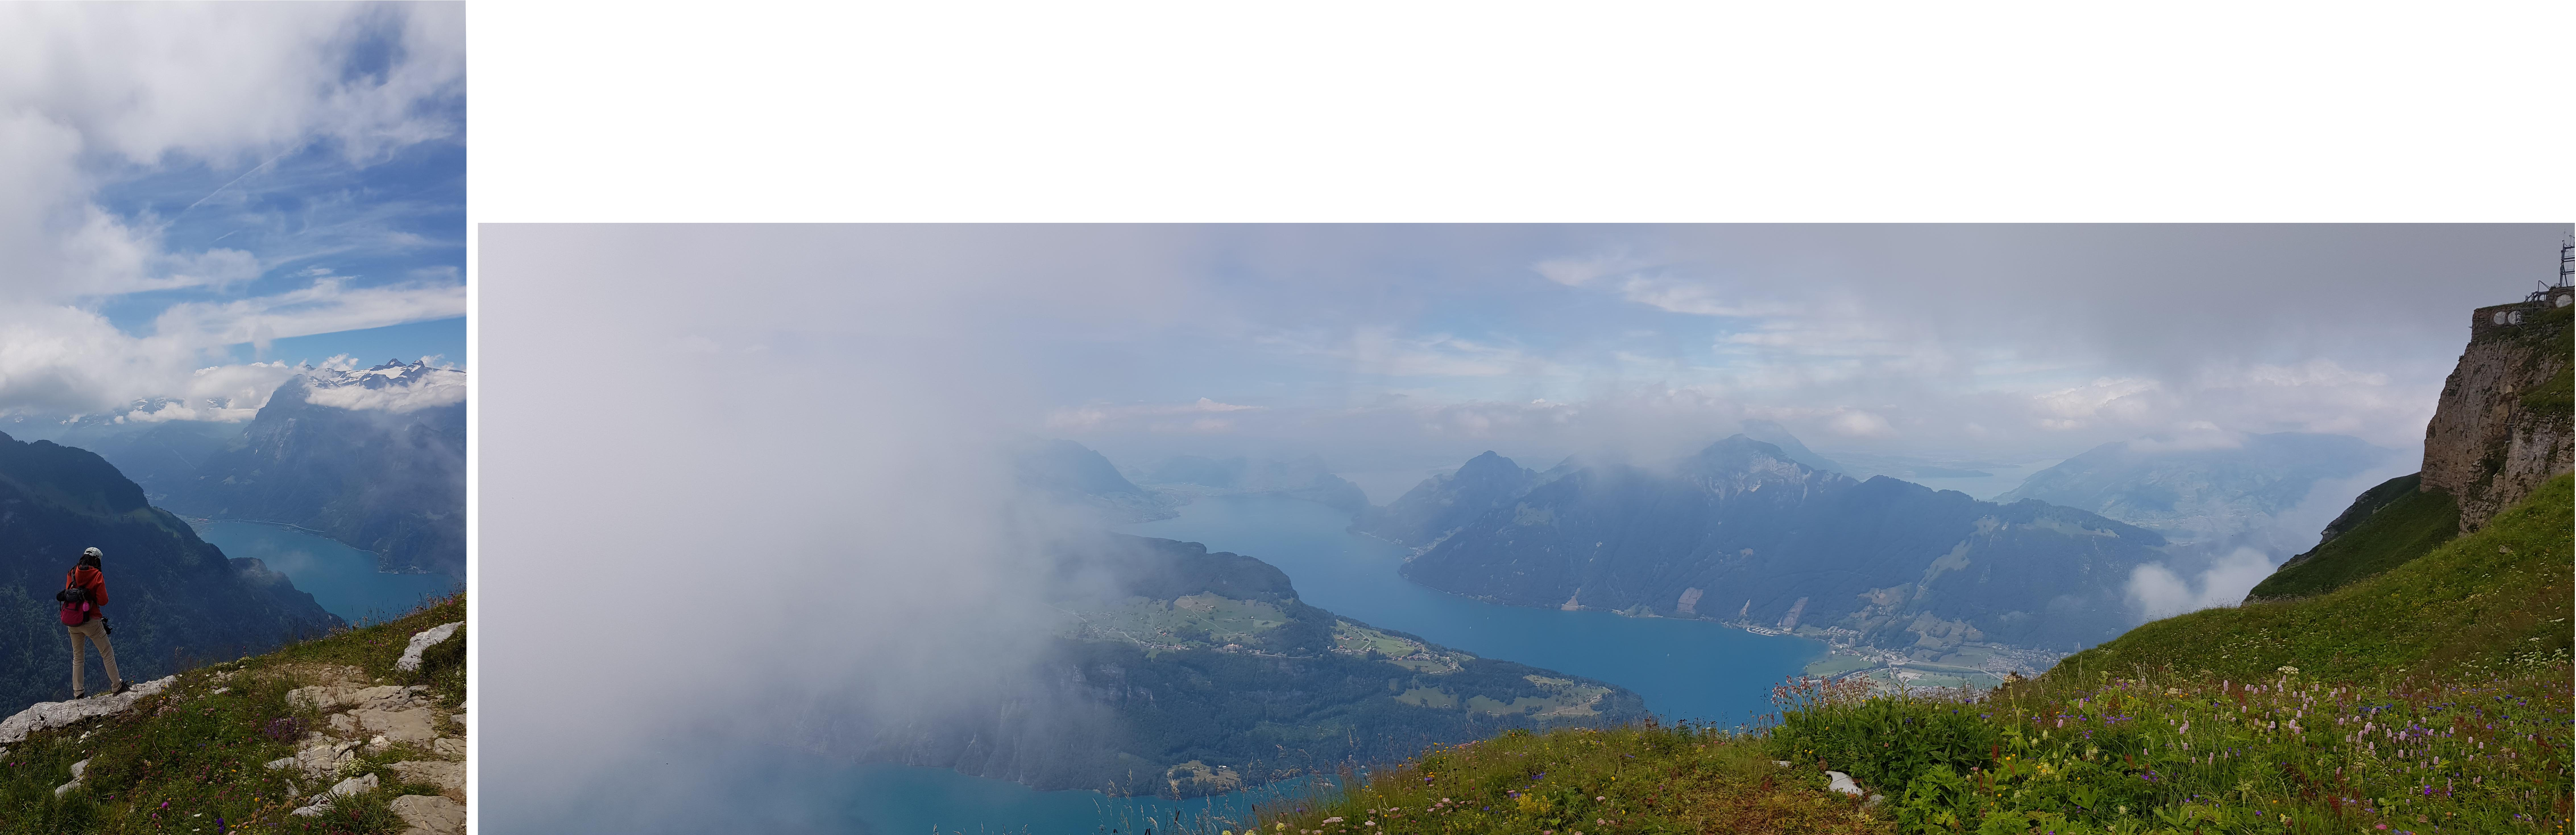 Lake Lucerne and Mount Rigi